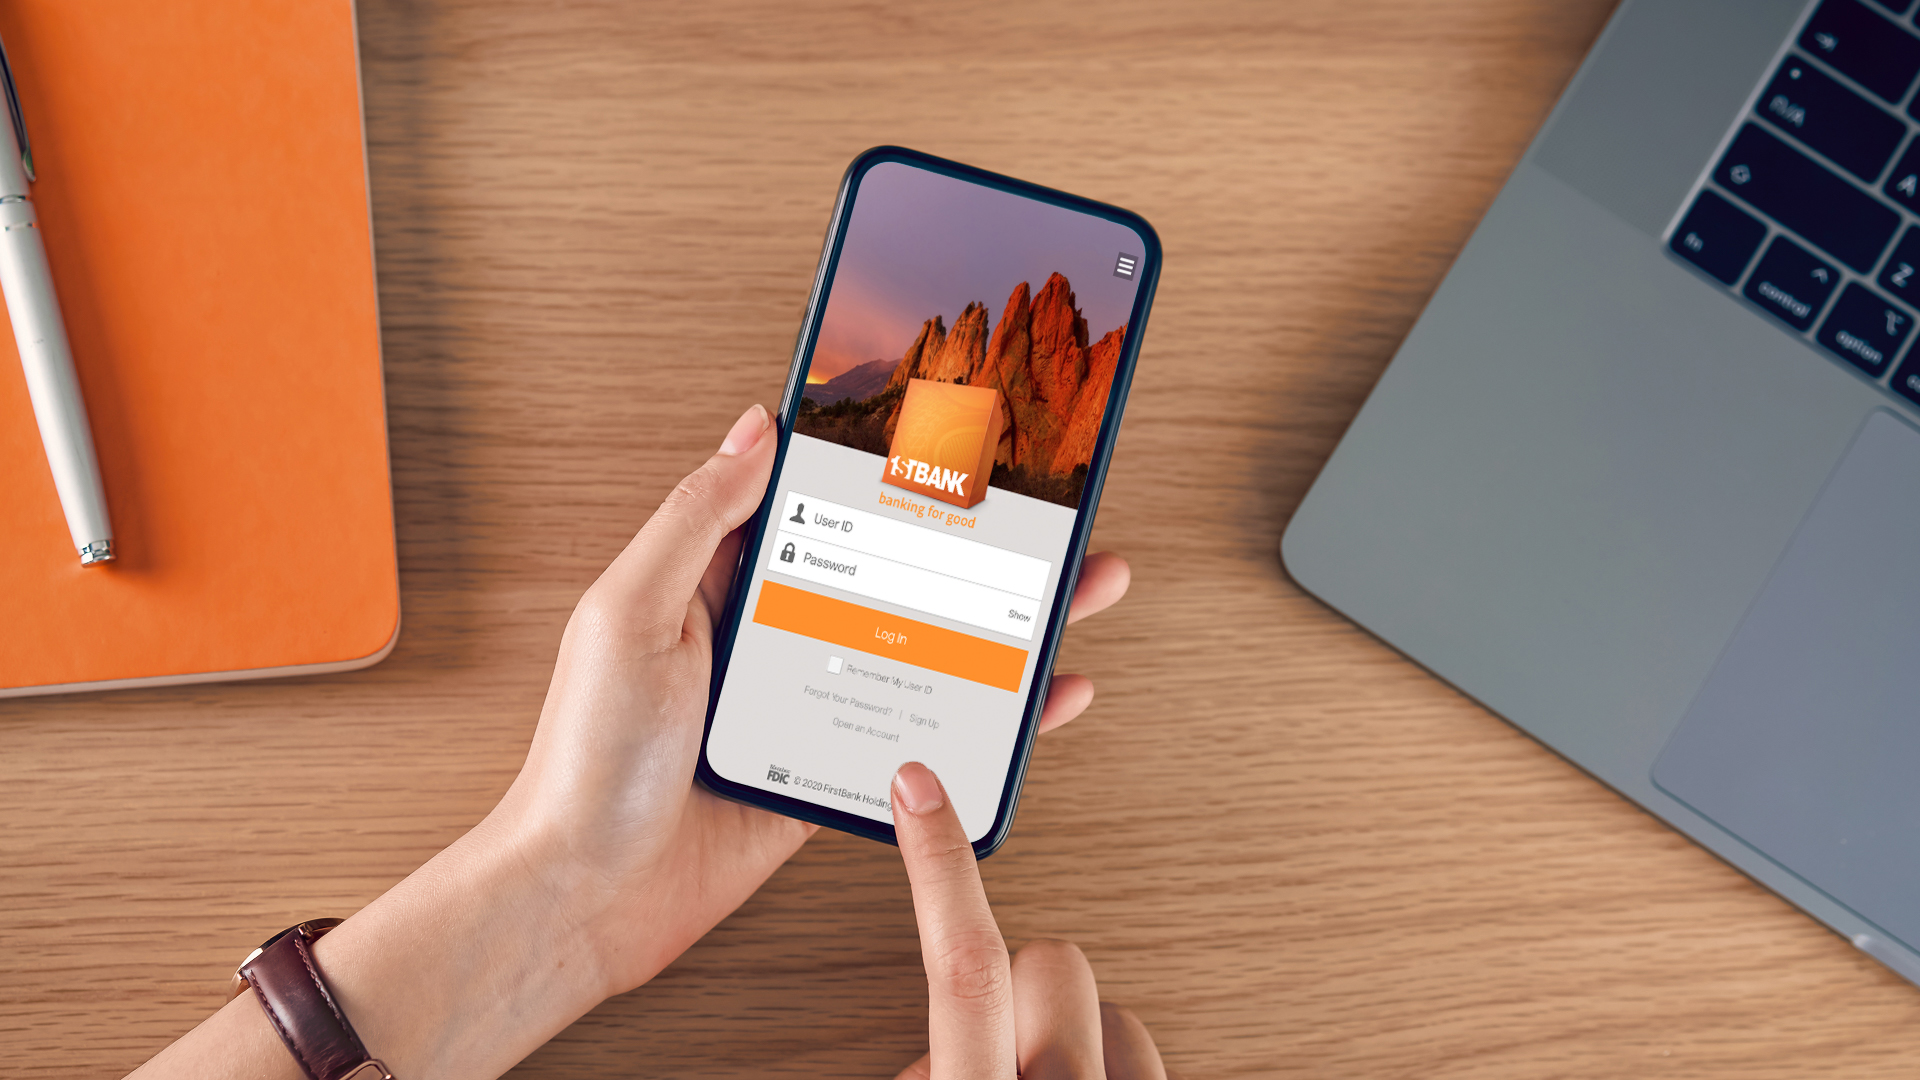 FirstBank mobile app